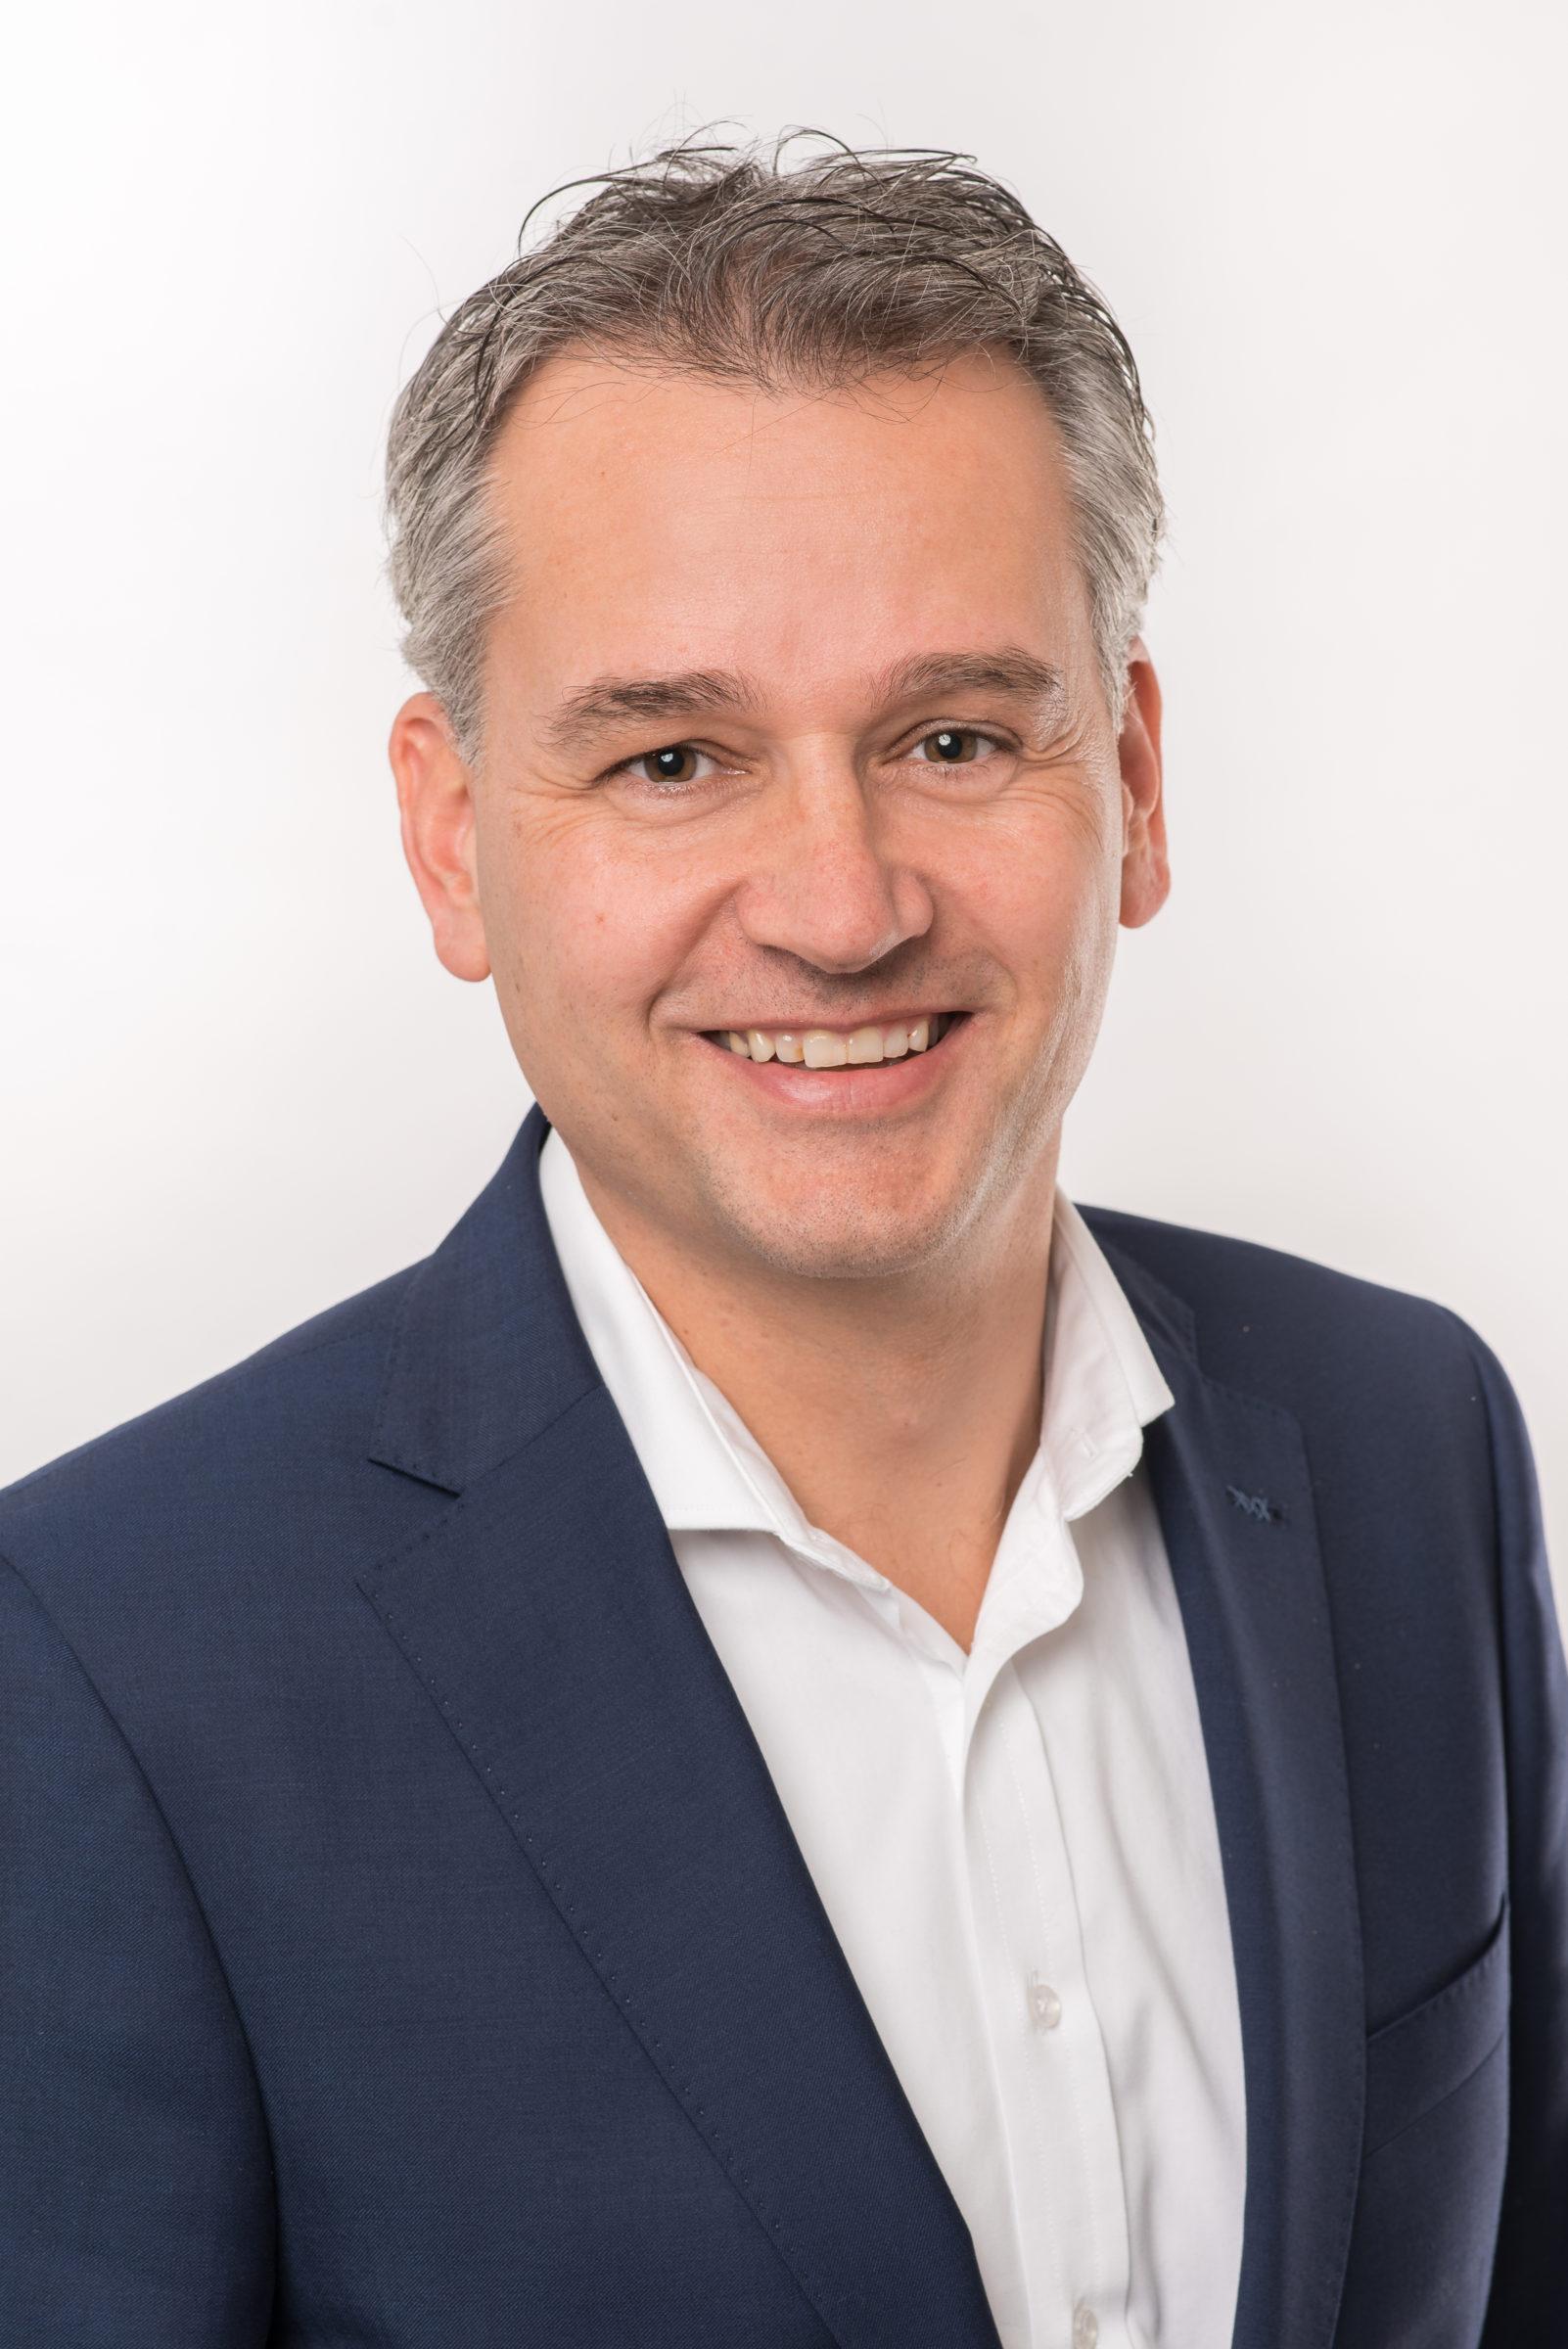 Portretfoto van medewerker Rien Raijmakers